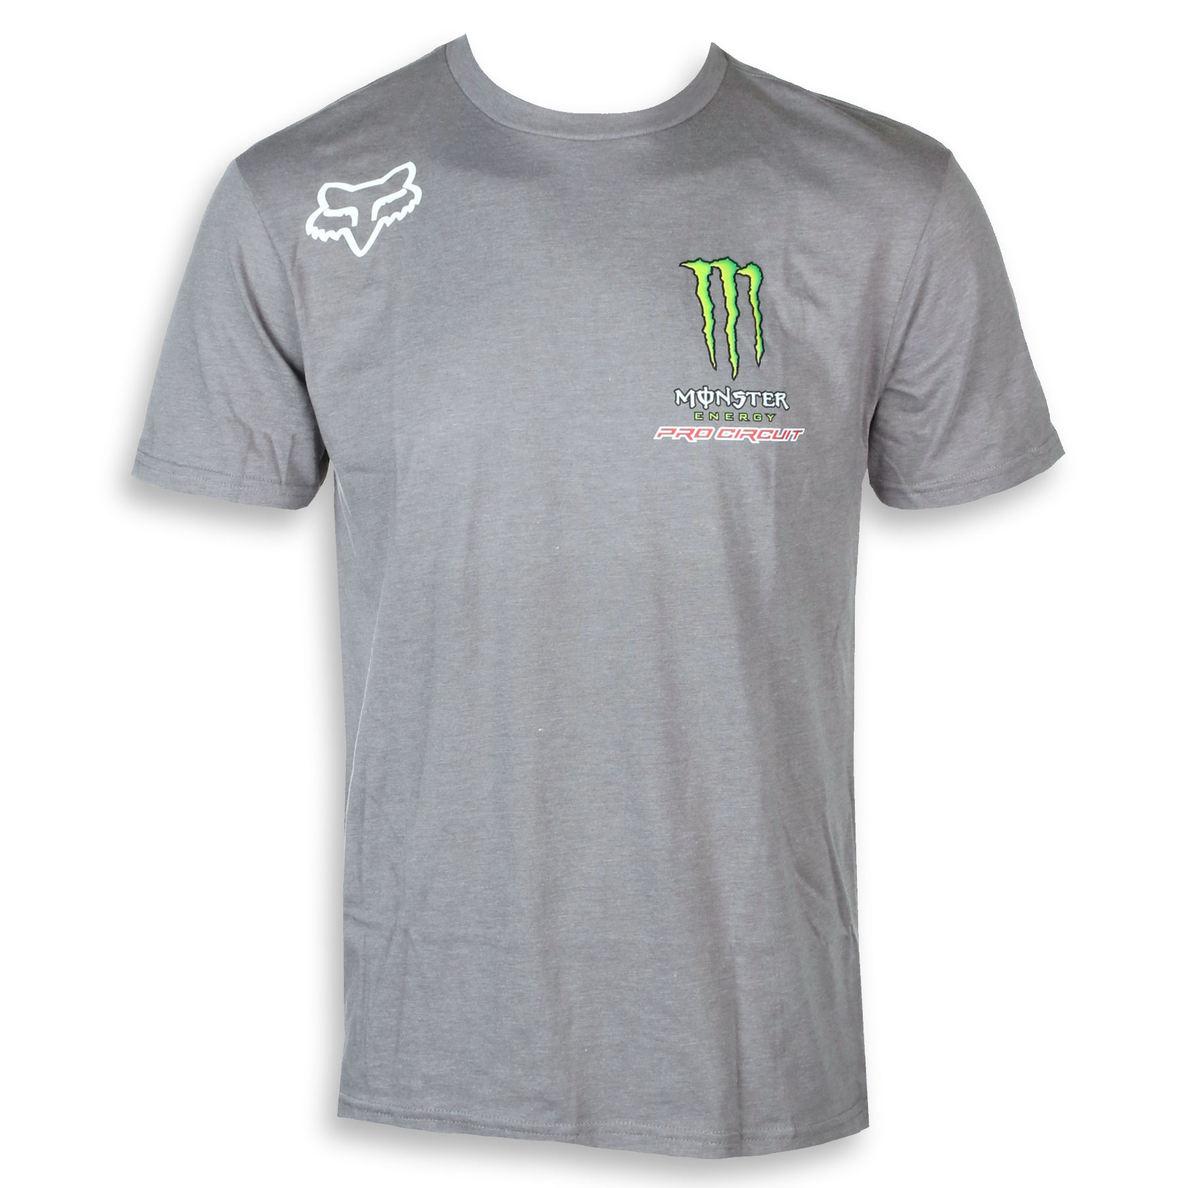 237ff5224d utcai póló férfi - Monster - FOX - 24410-572 - Metalshop.hu